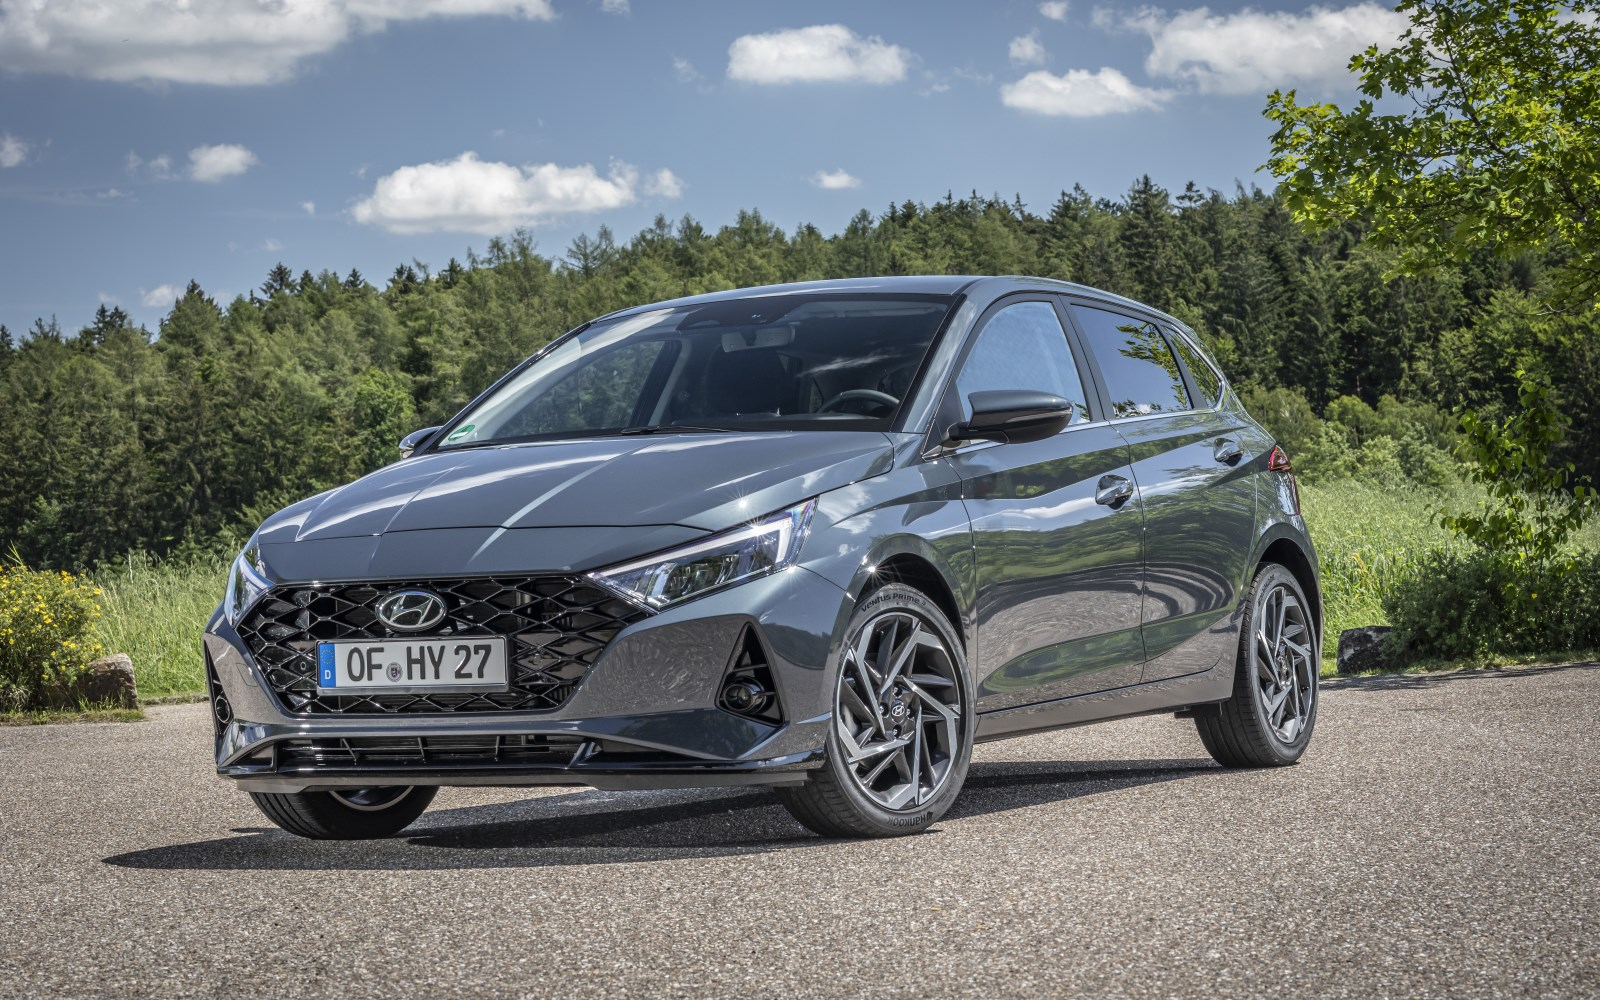 Hyundai i20 Nowej Generacji - znamy ceny tego hatchbacka!